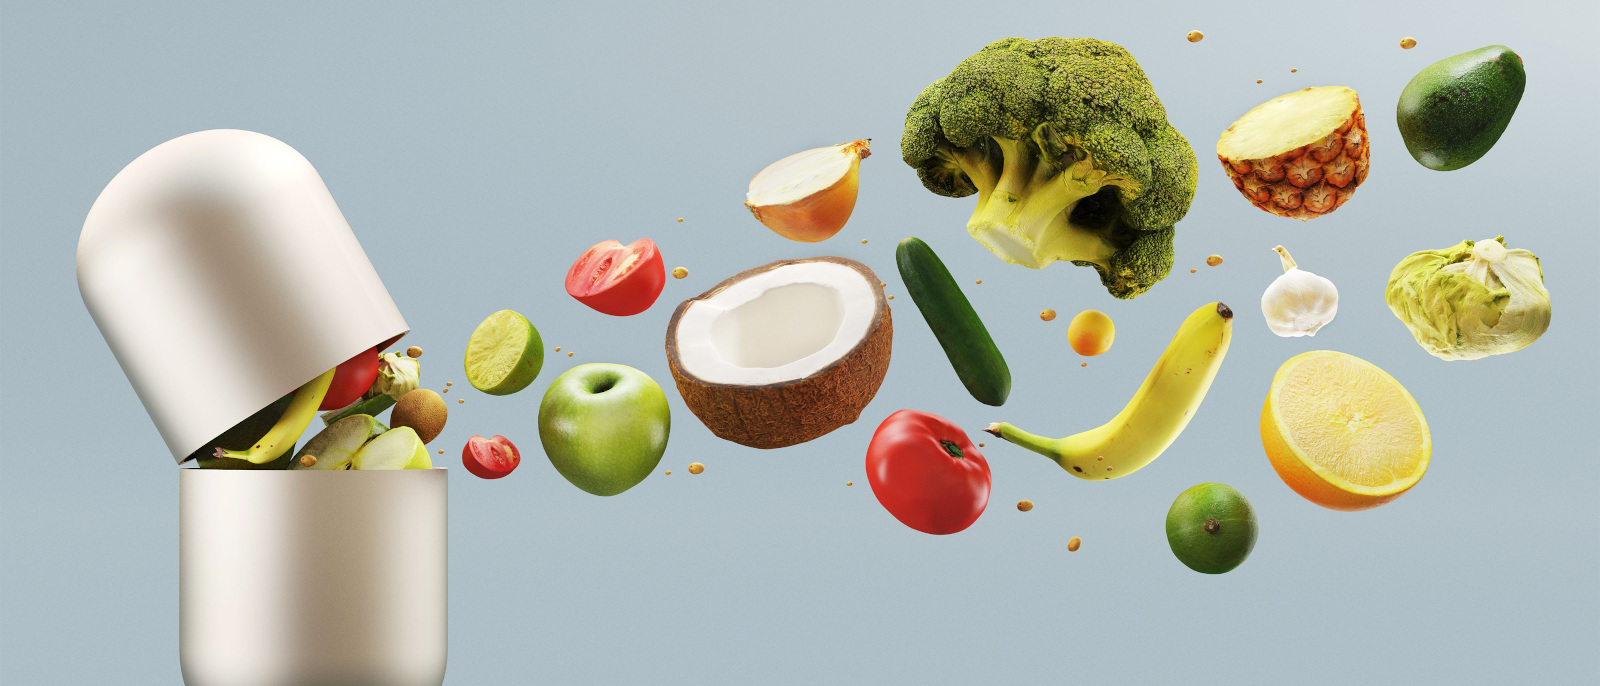 cariati-integratori-vitamine